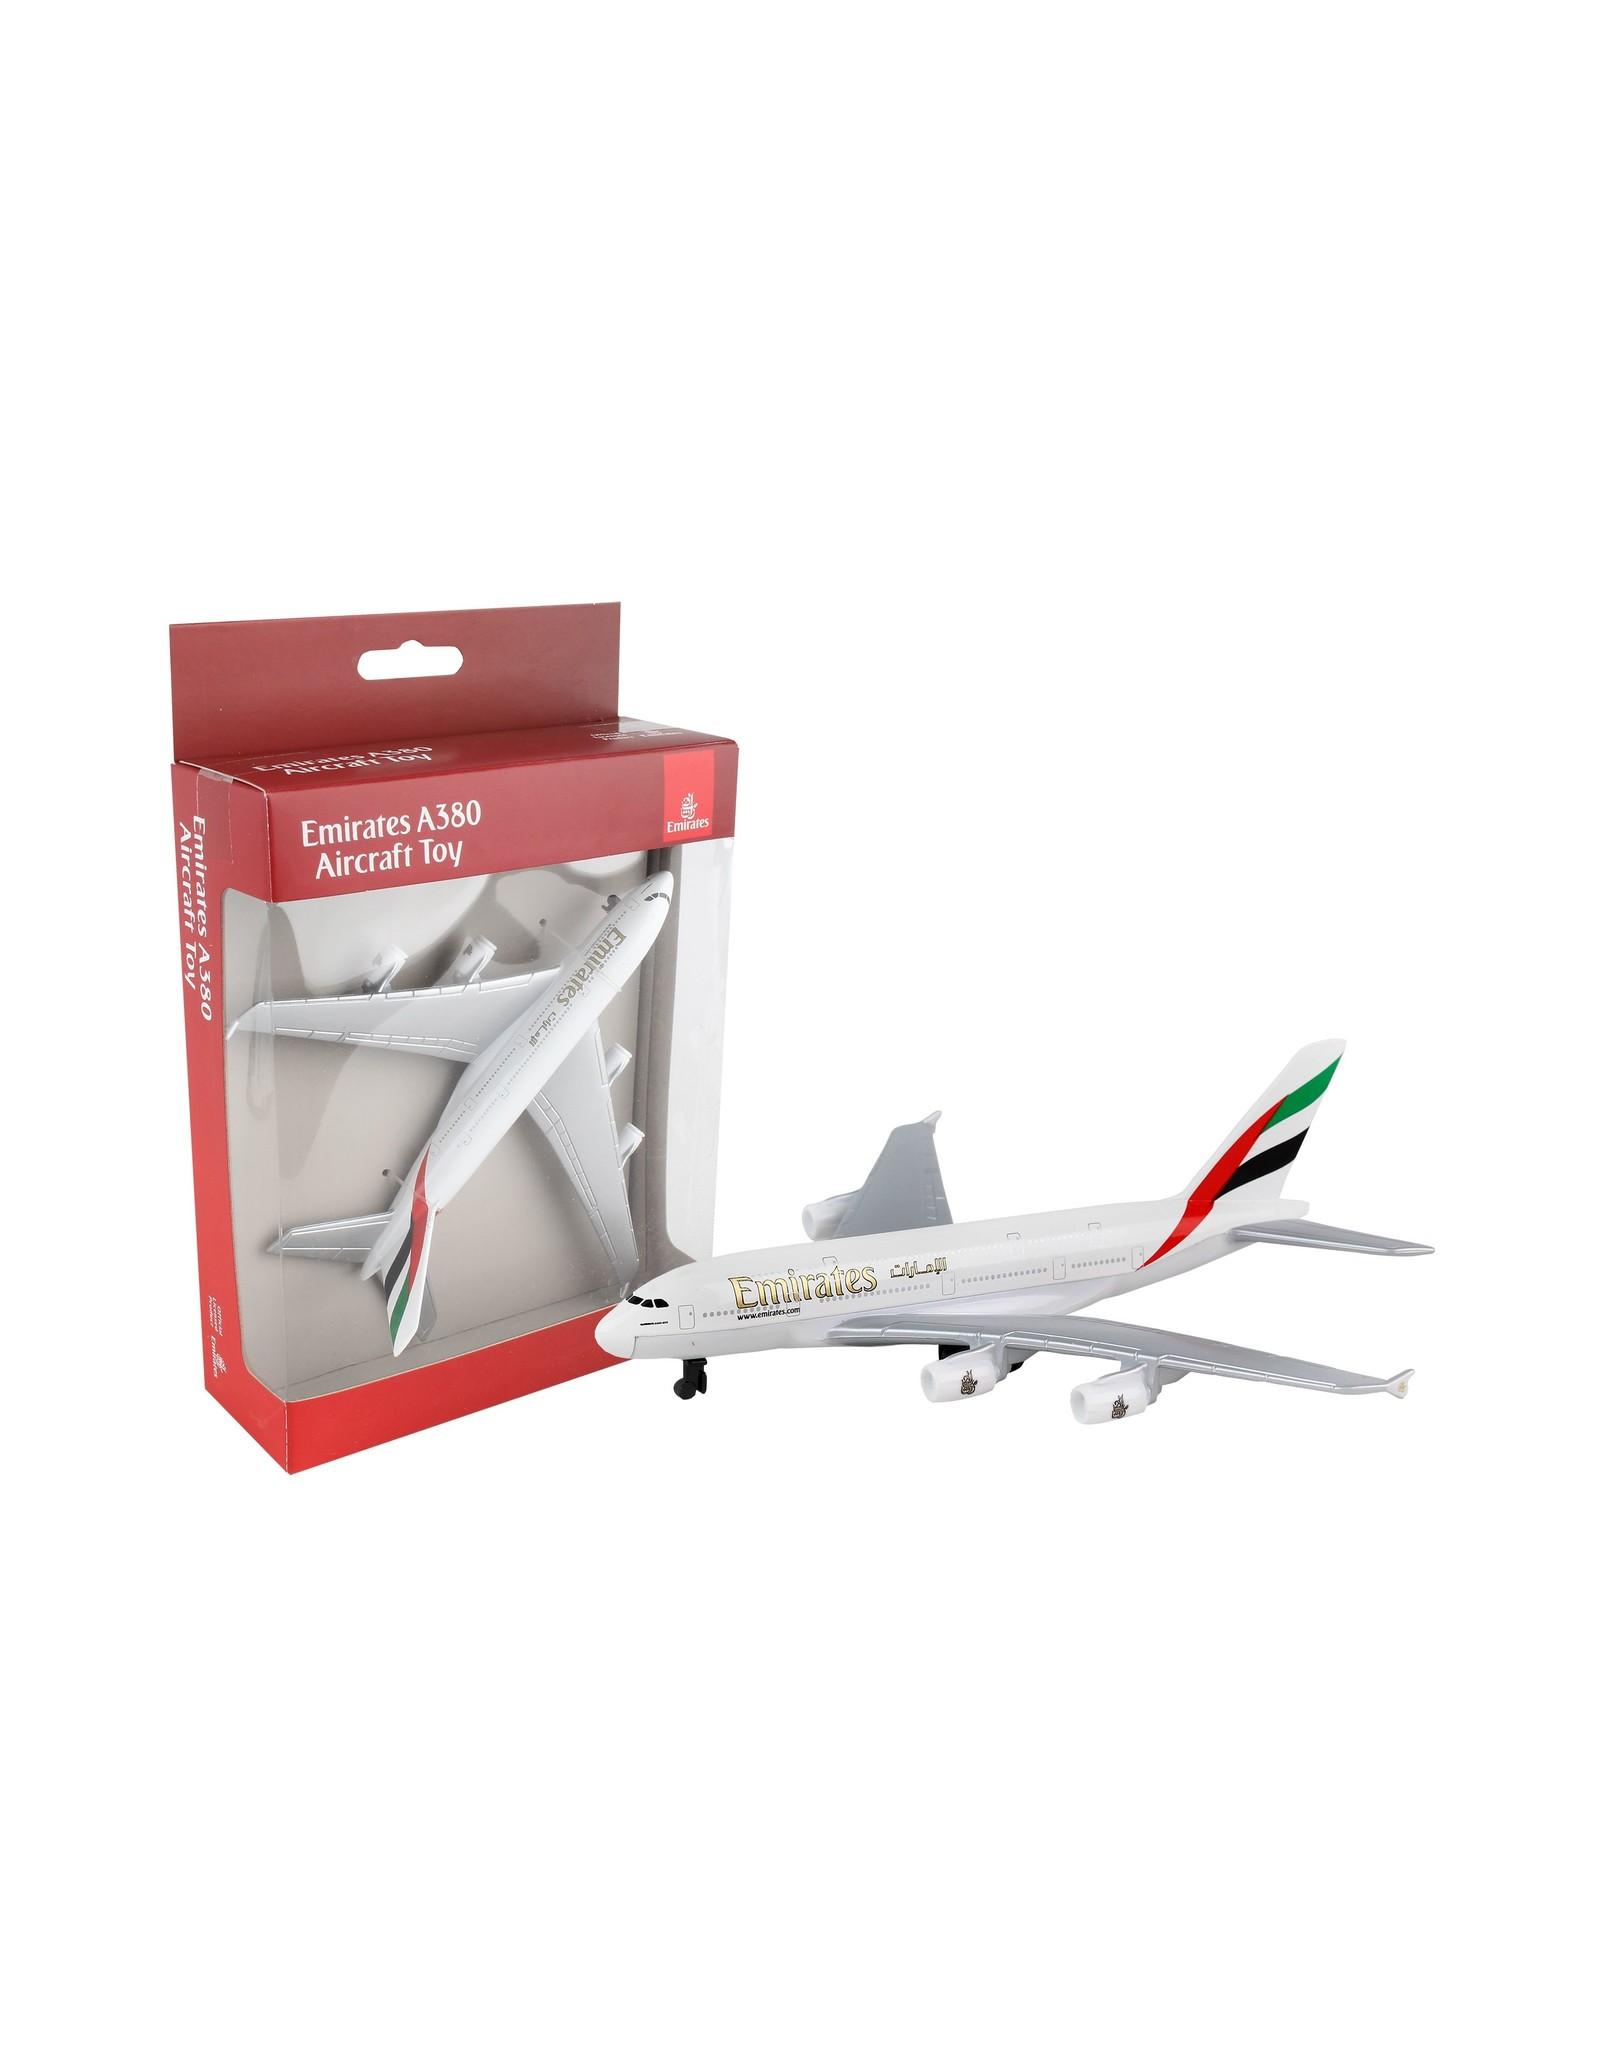 Single Plane Emirates A380